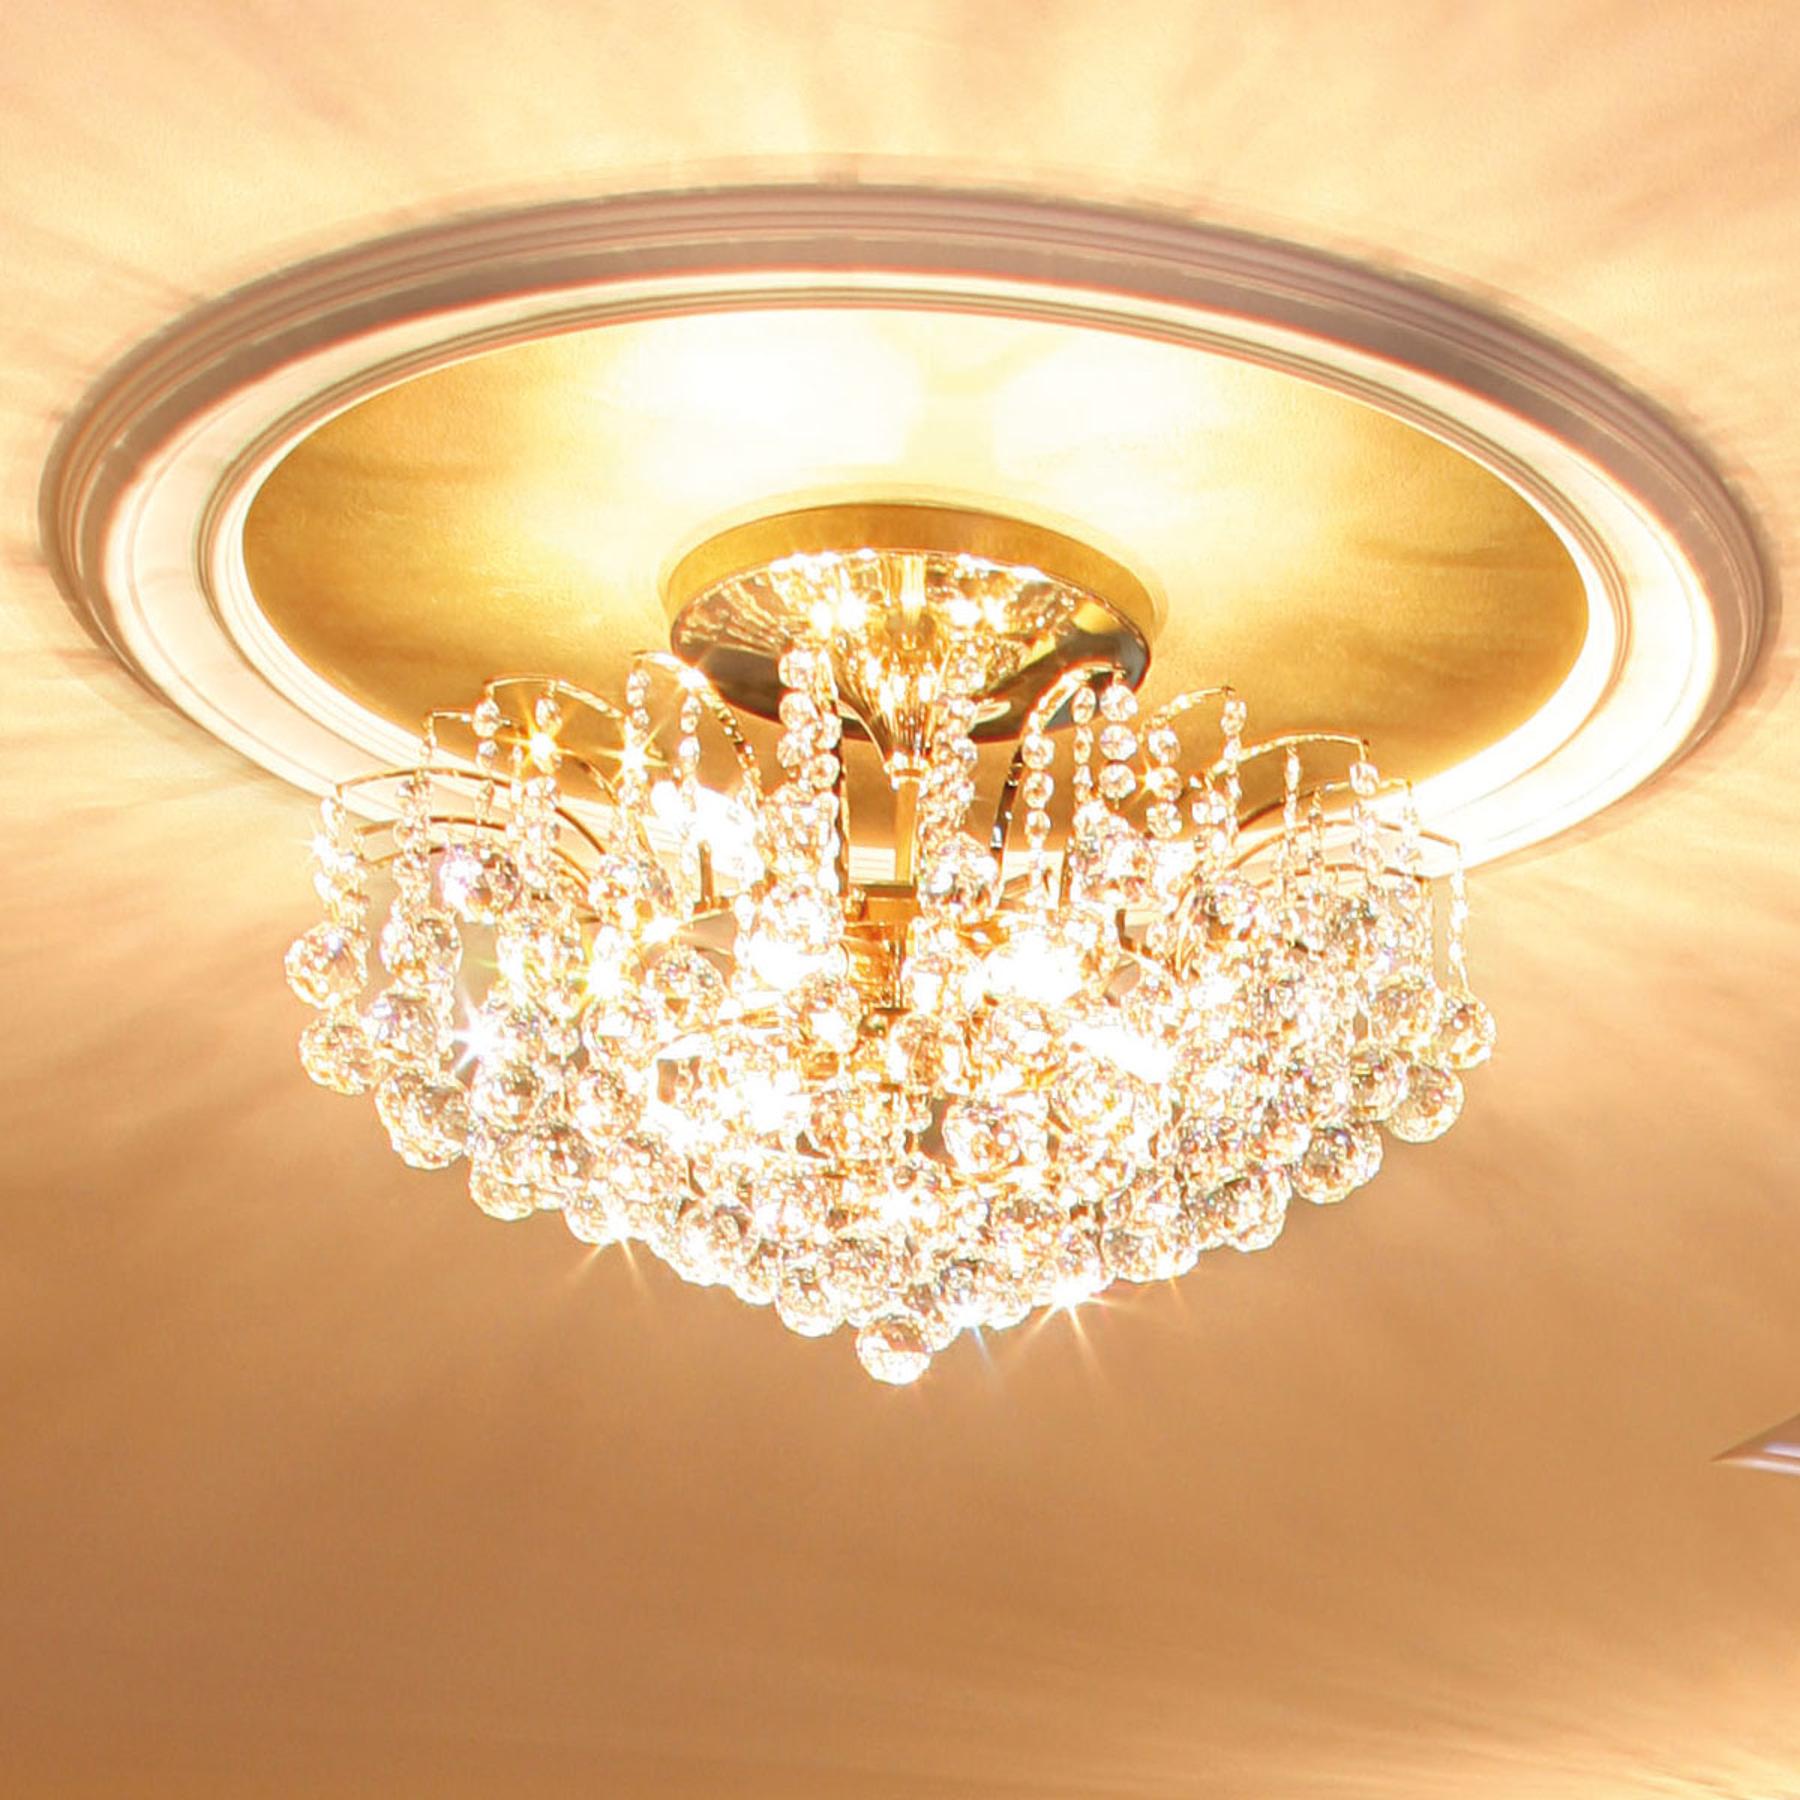 Lampa sufitowa LENNARDA - 24-karatowe złoto